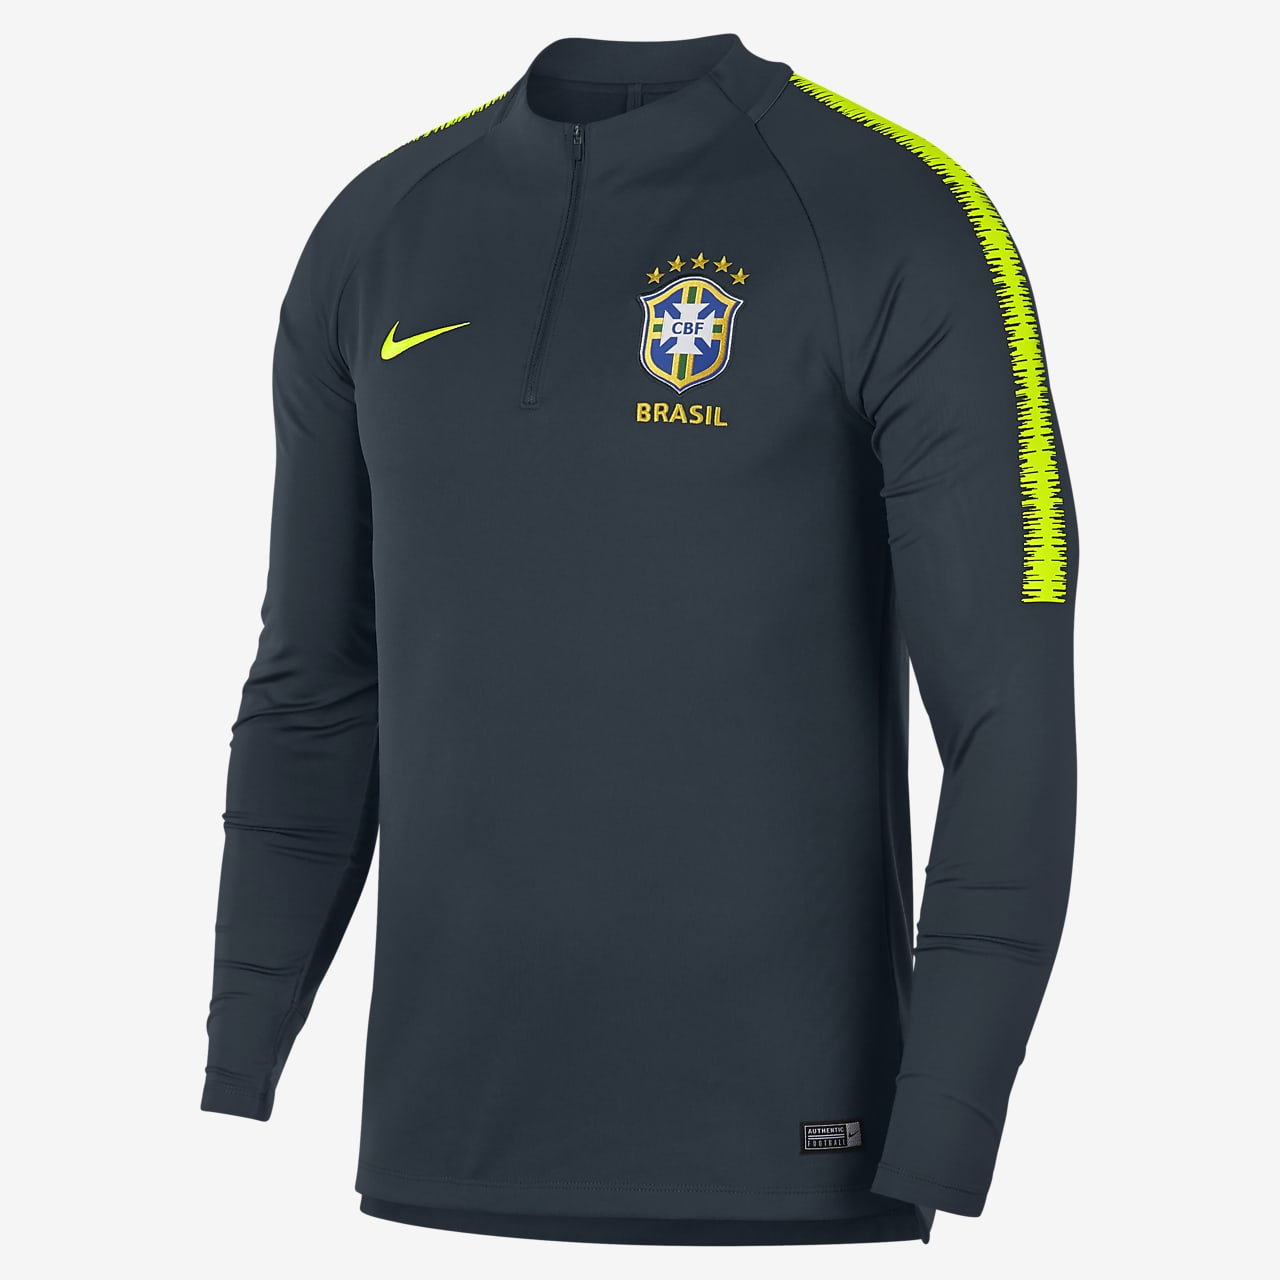 Camisola de futebol de manga comprida Brasil CBF Dri-FIT Squad Drill para homem